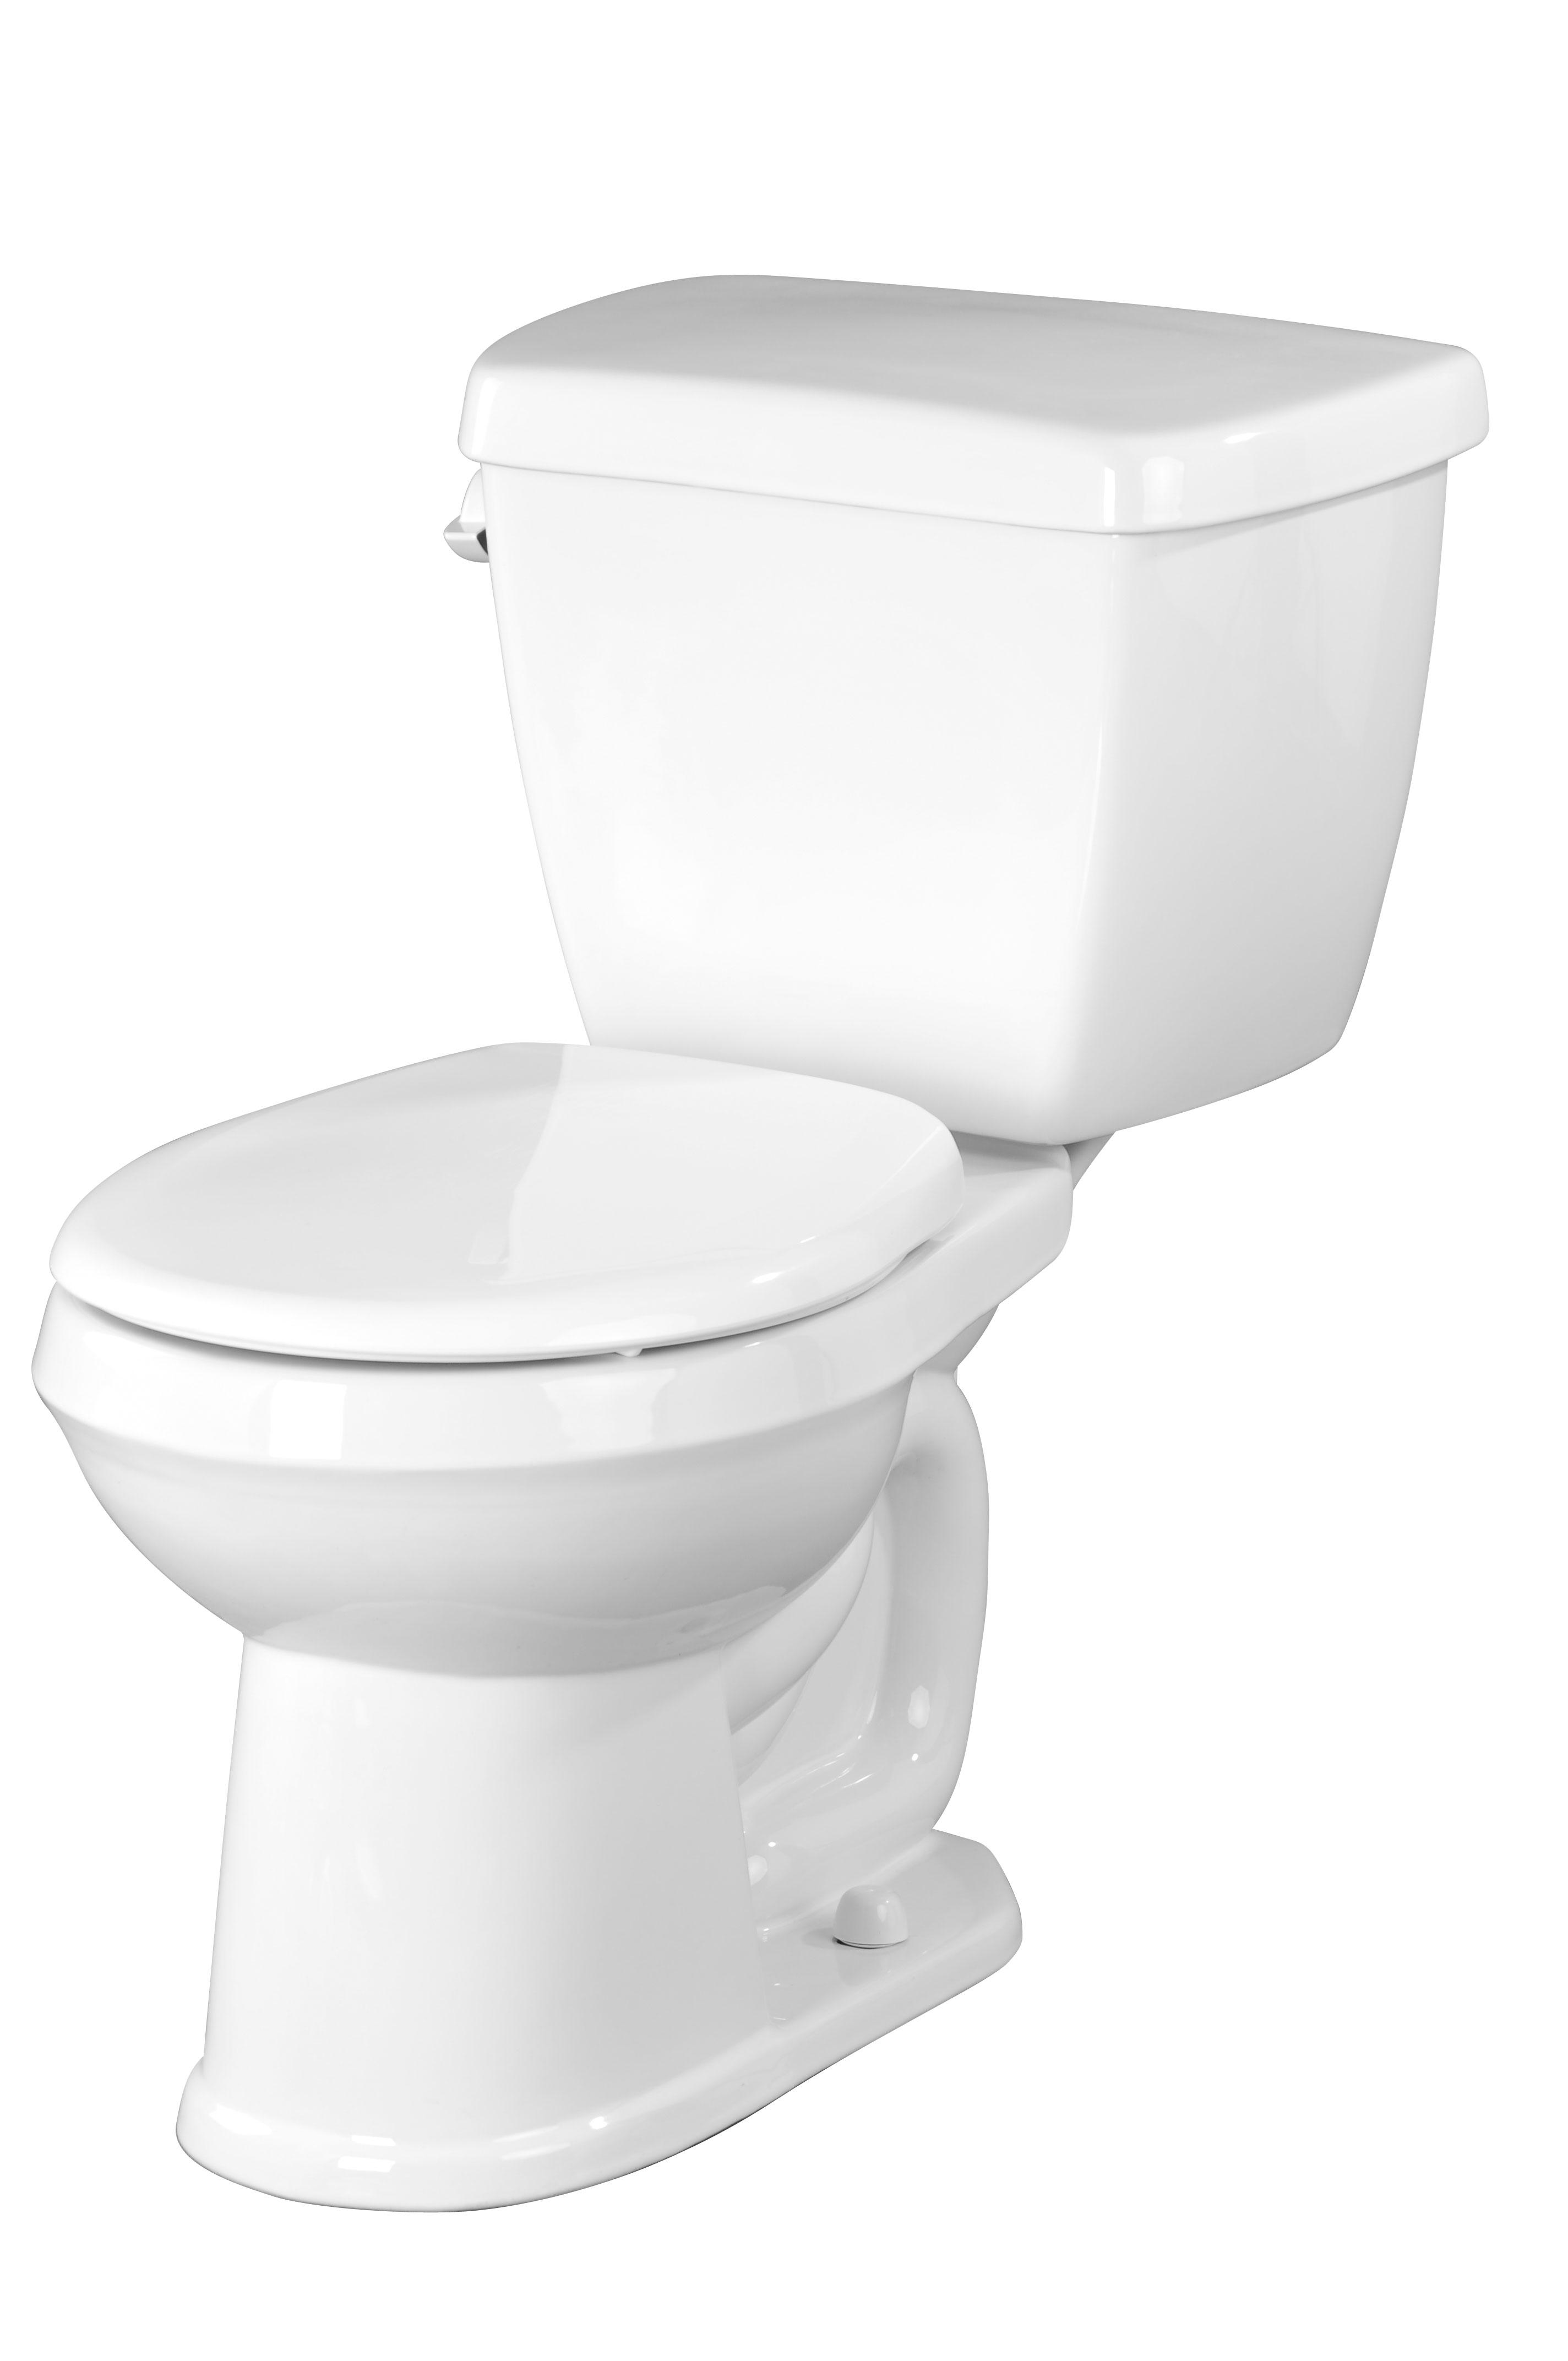 Gerber Toilet Flush Handle